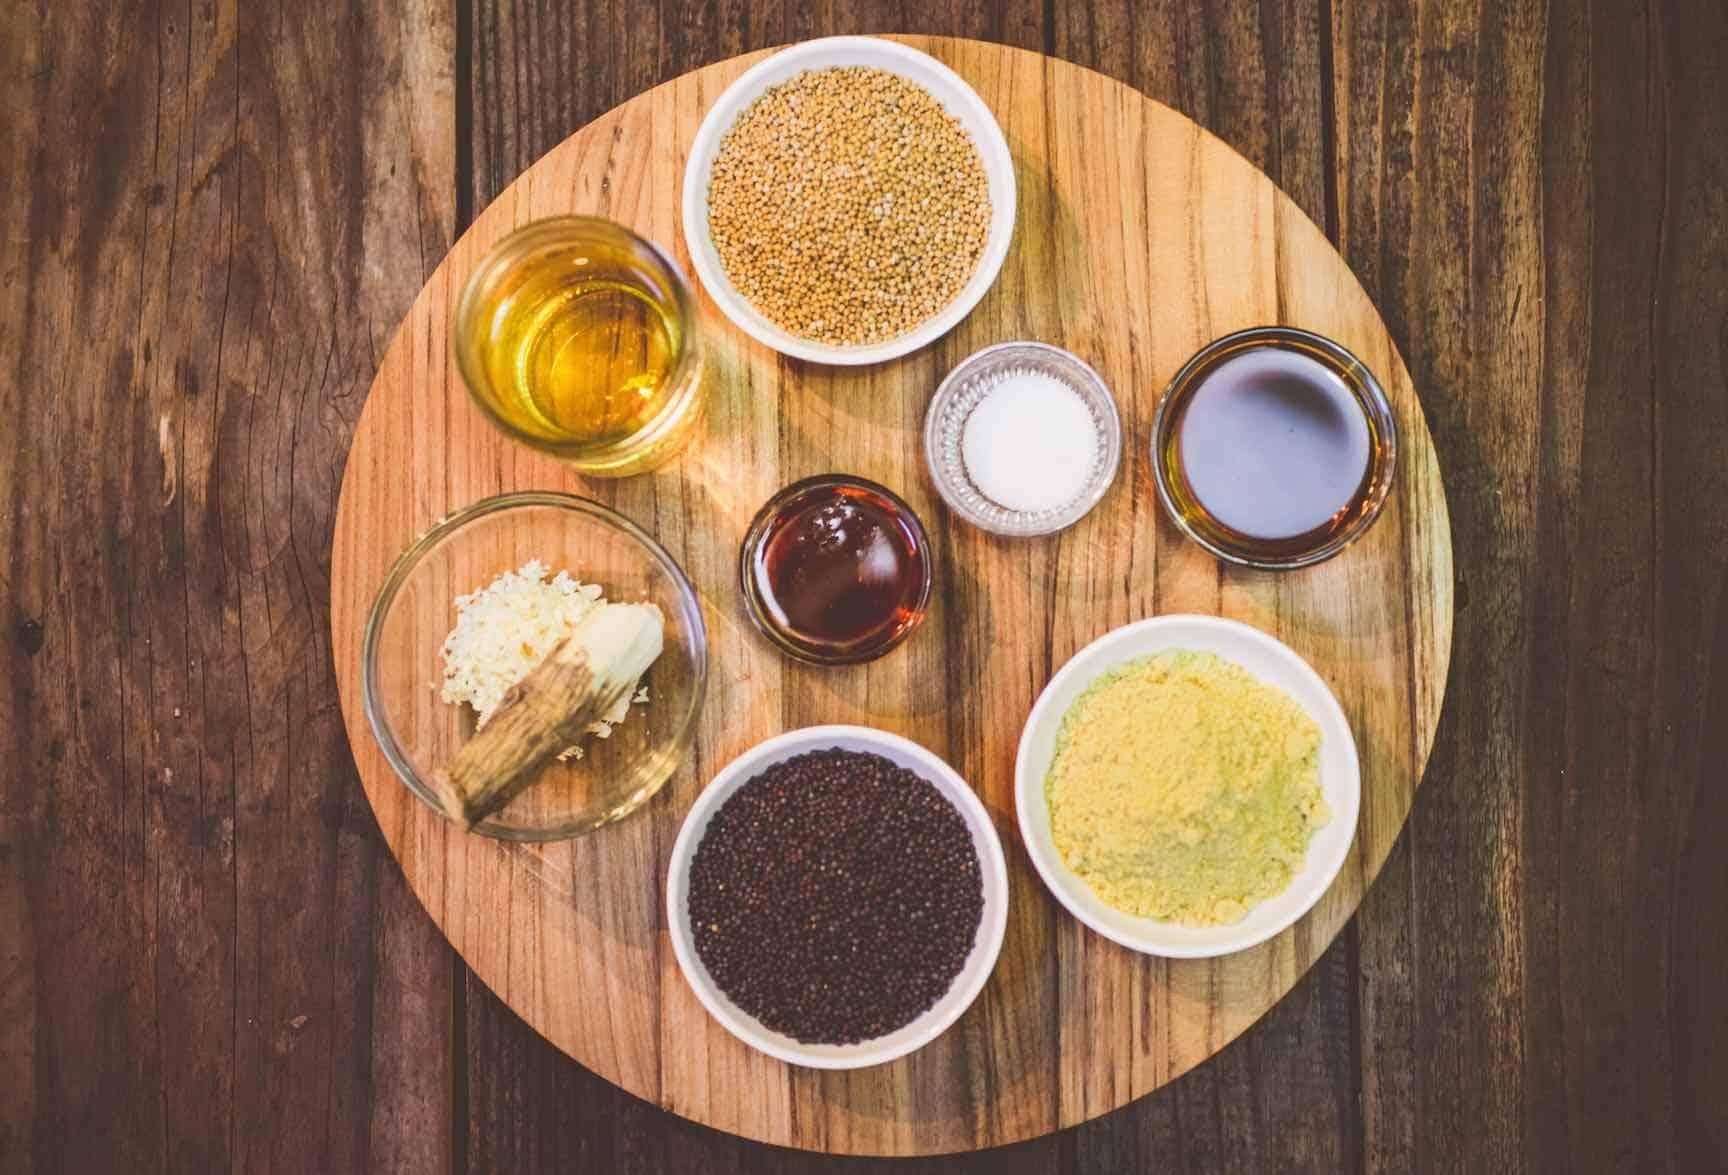 Horse radish mustard recipe